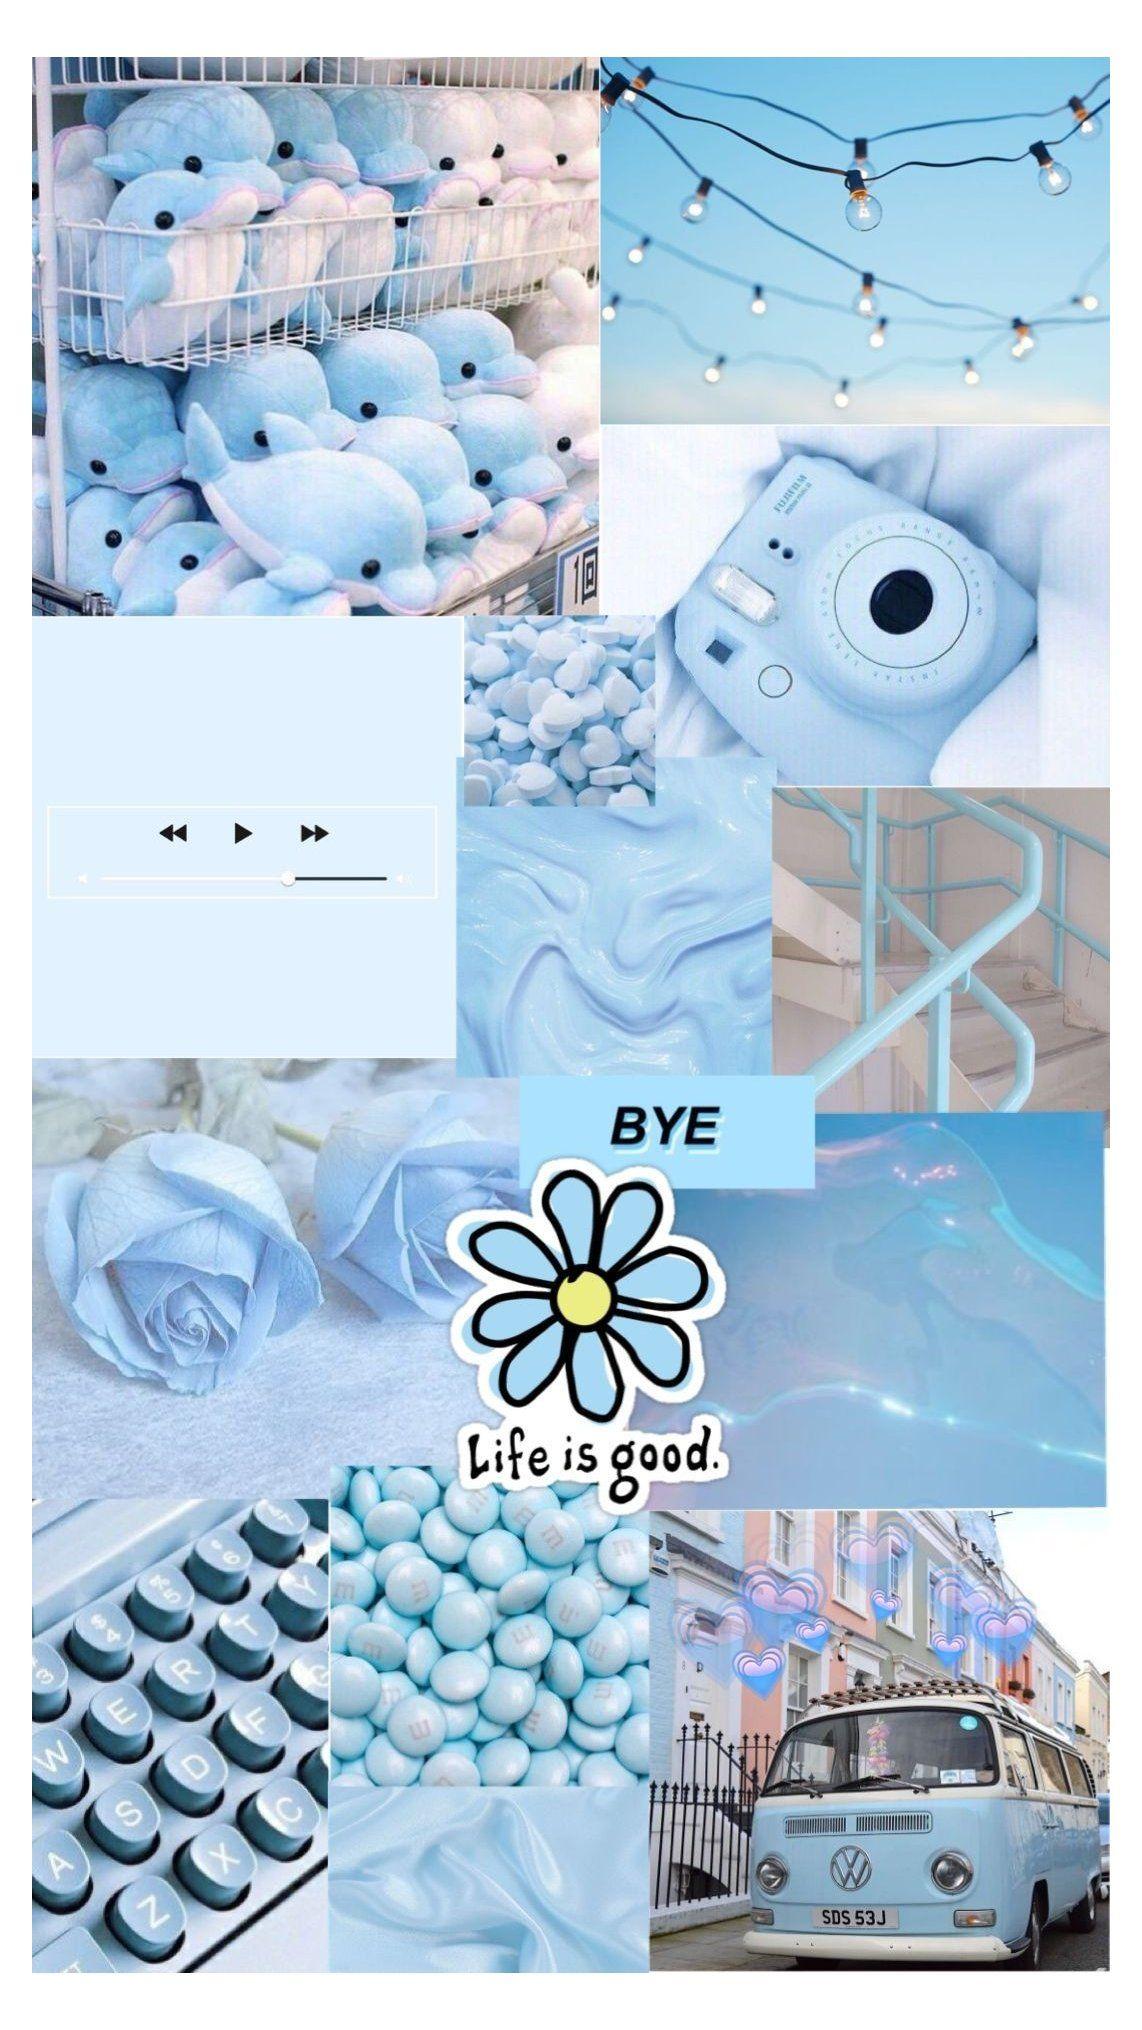 44 Koleksi Gambar Kolase Unicorn Hd Terbaik Cool Backgrounds Blue Coolbackgroundsblue D In 2021 Iphone Wallpaper Girly Cute Blue Wallpaper Iphone Wallpaper Vintage